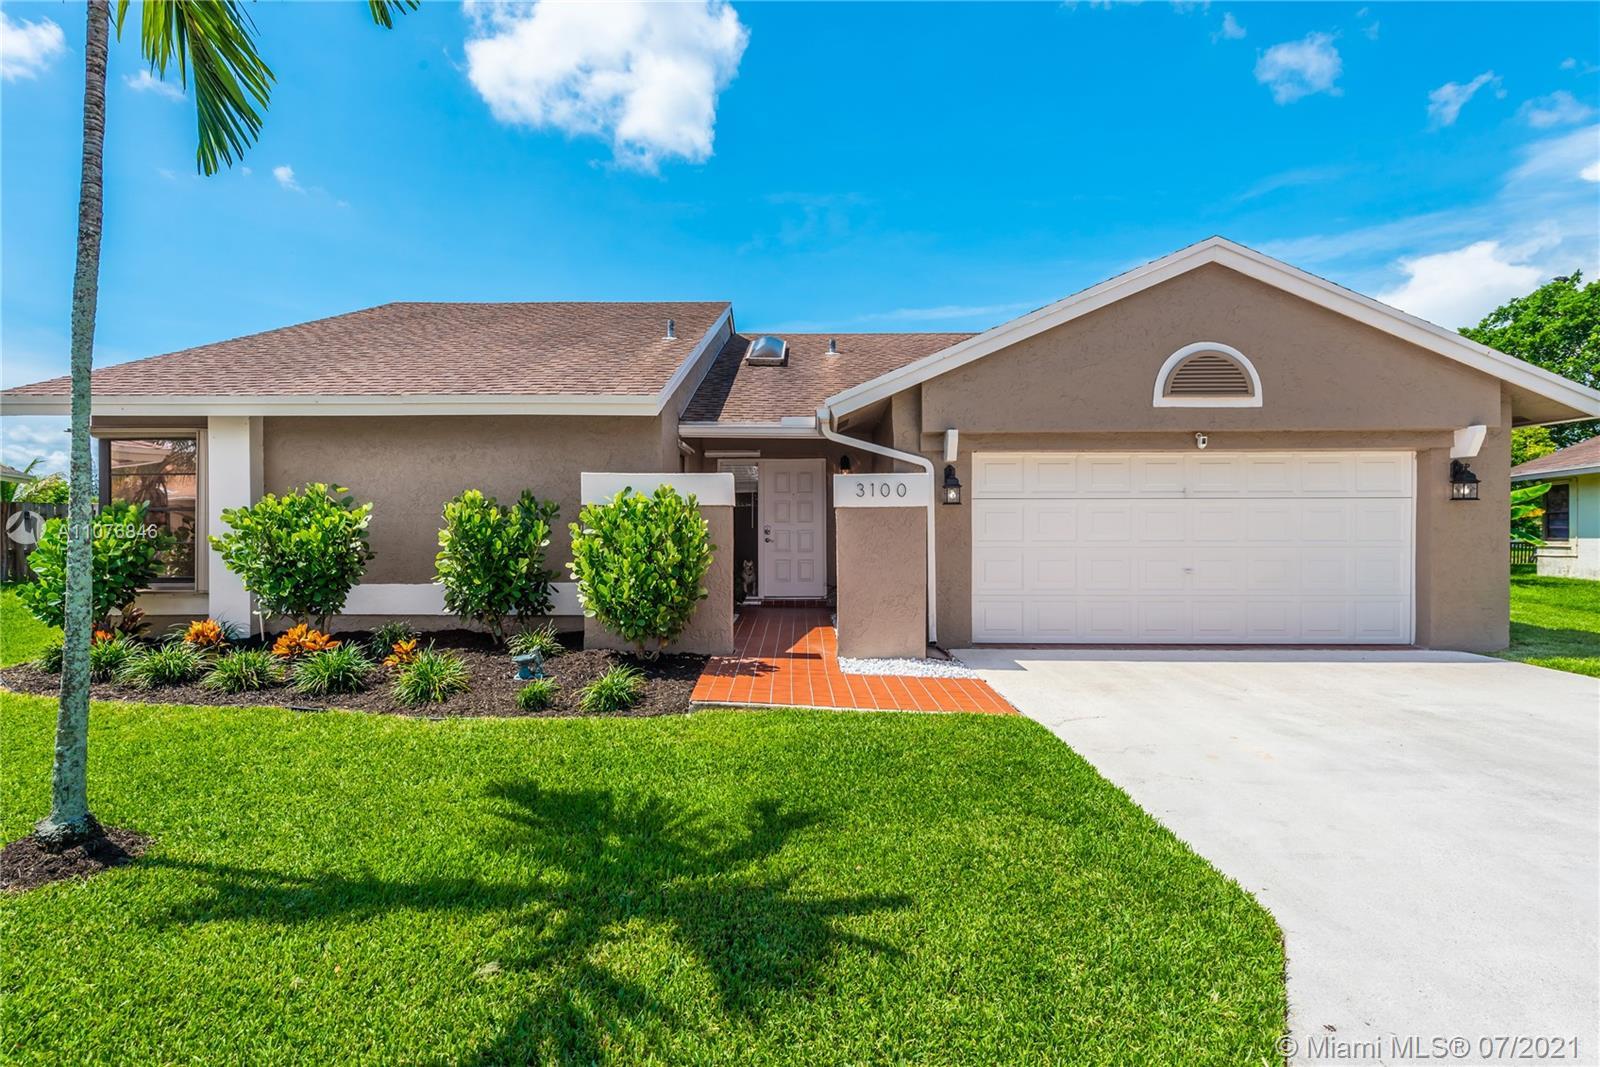 Welleby - 3100 NW 109th Ave, Sunrise, FL 33351